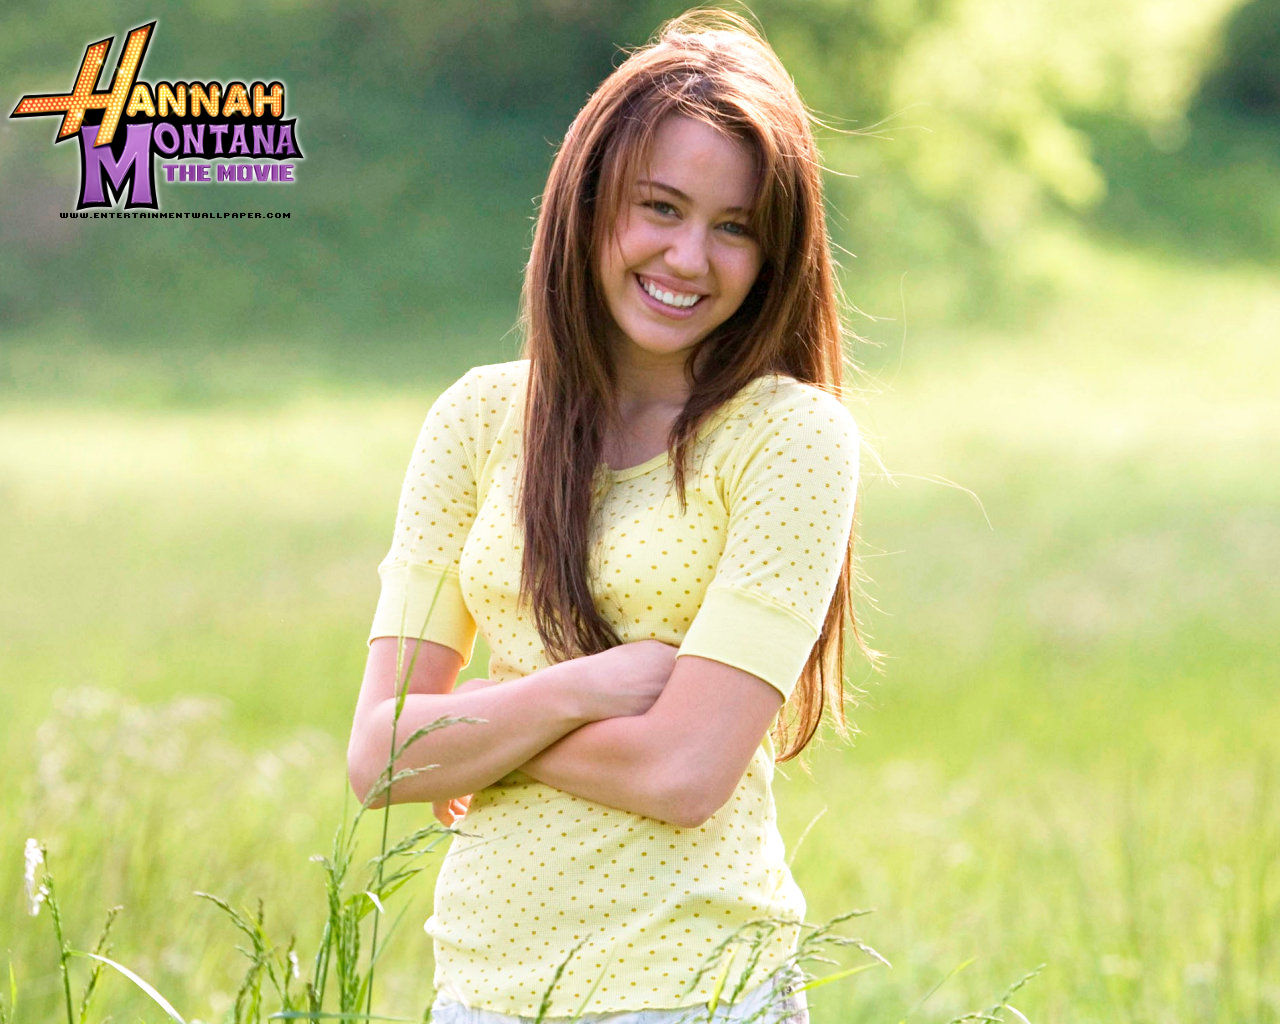 Miley Stewart vs Hannah Montana images Hannah Montana Images HD